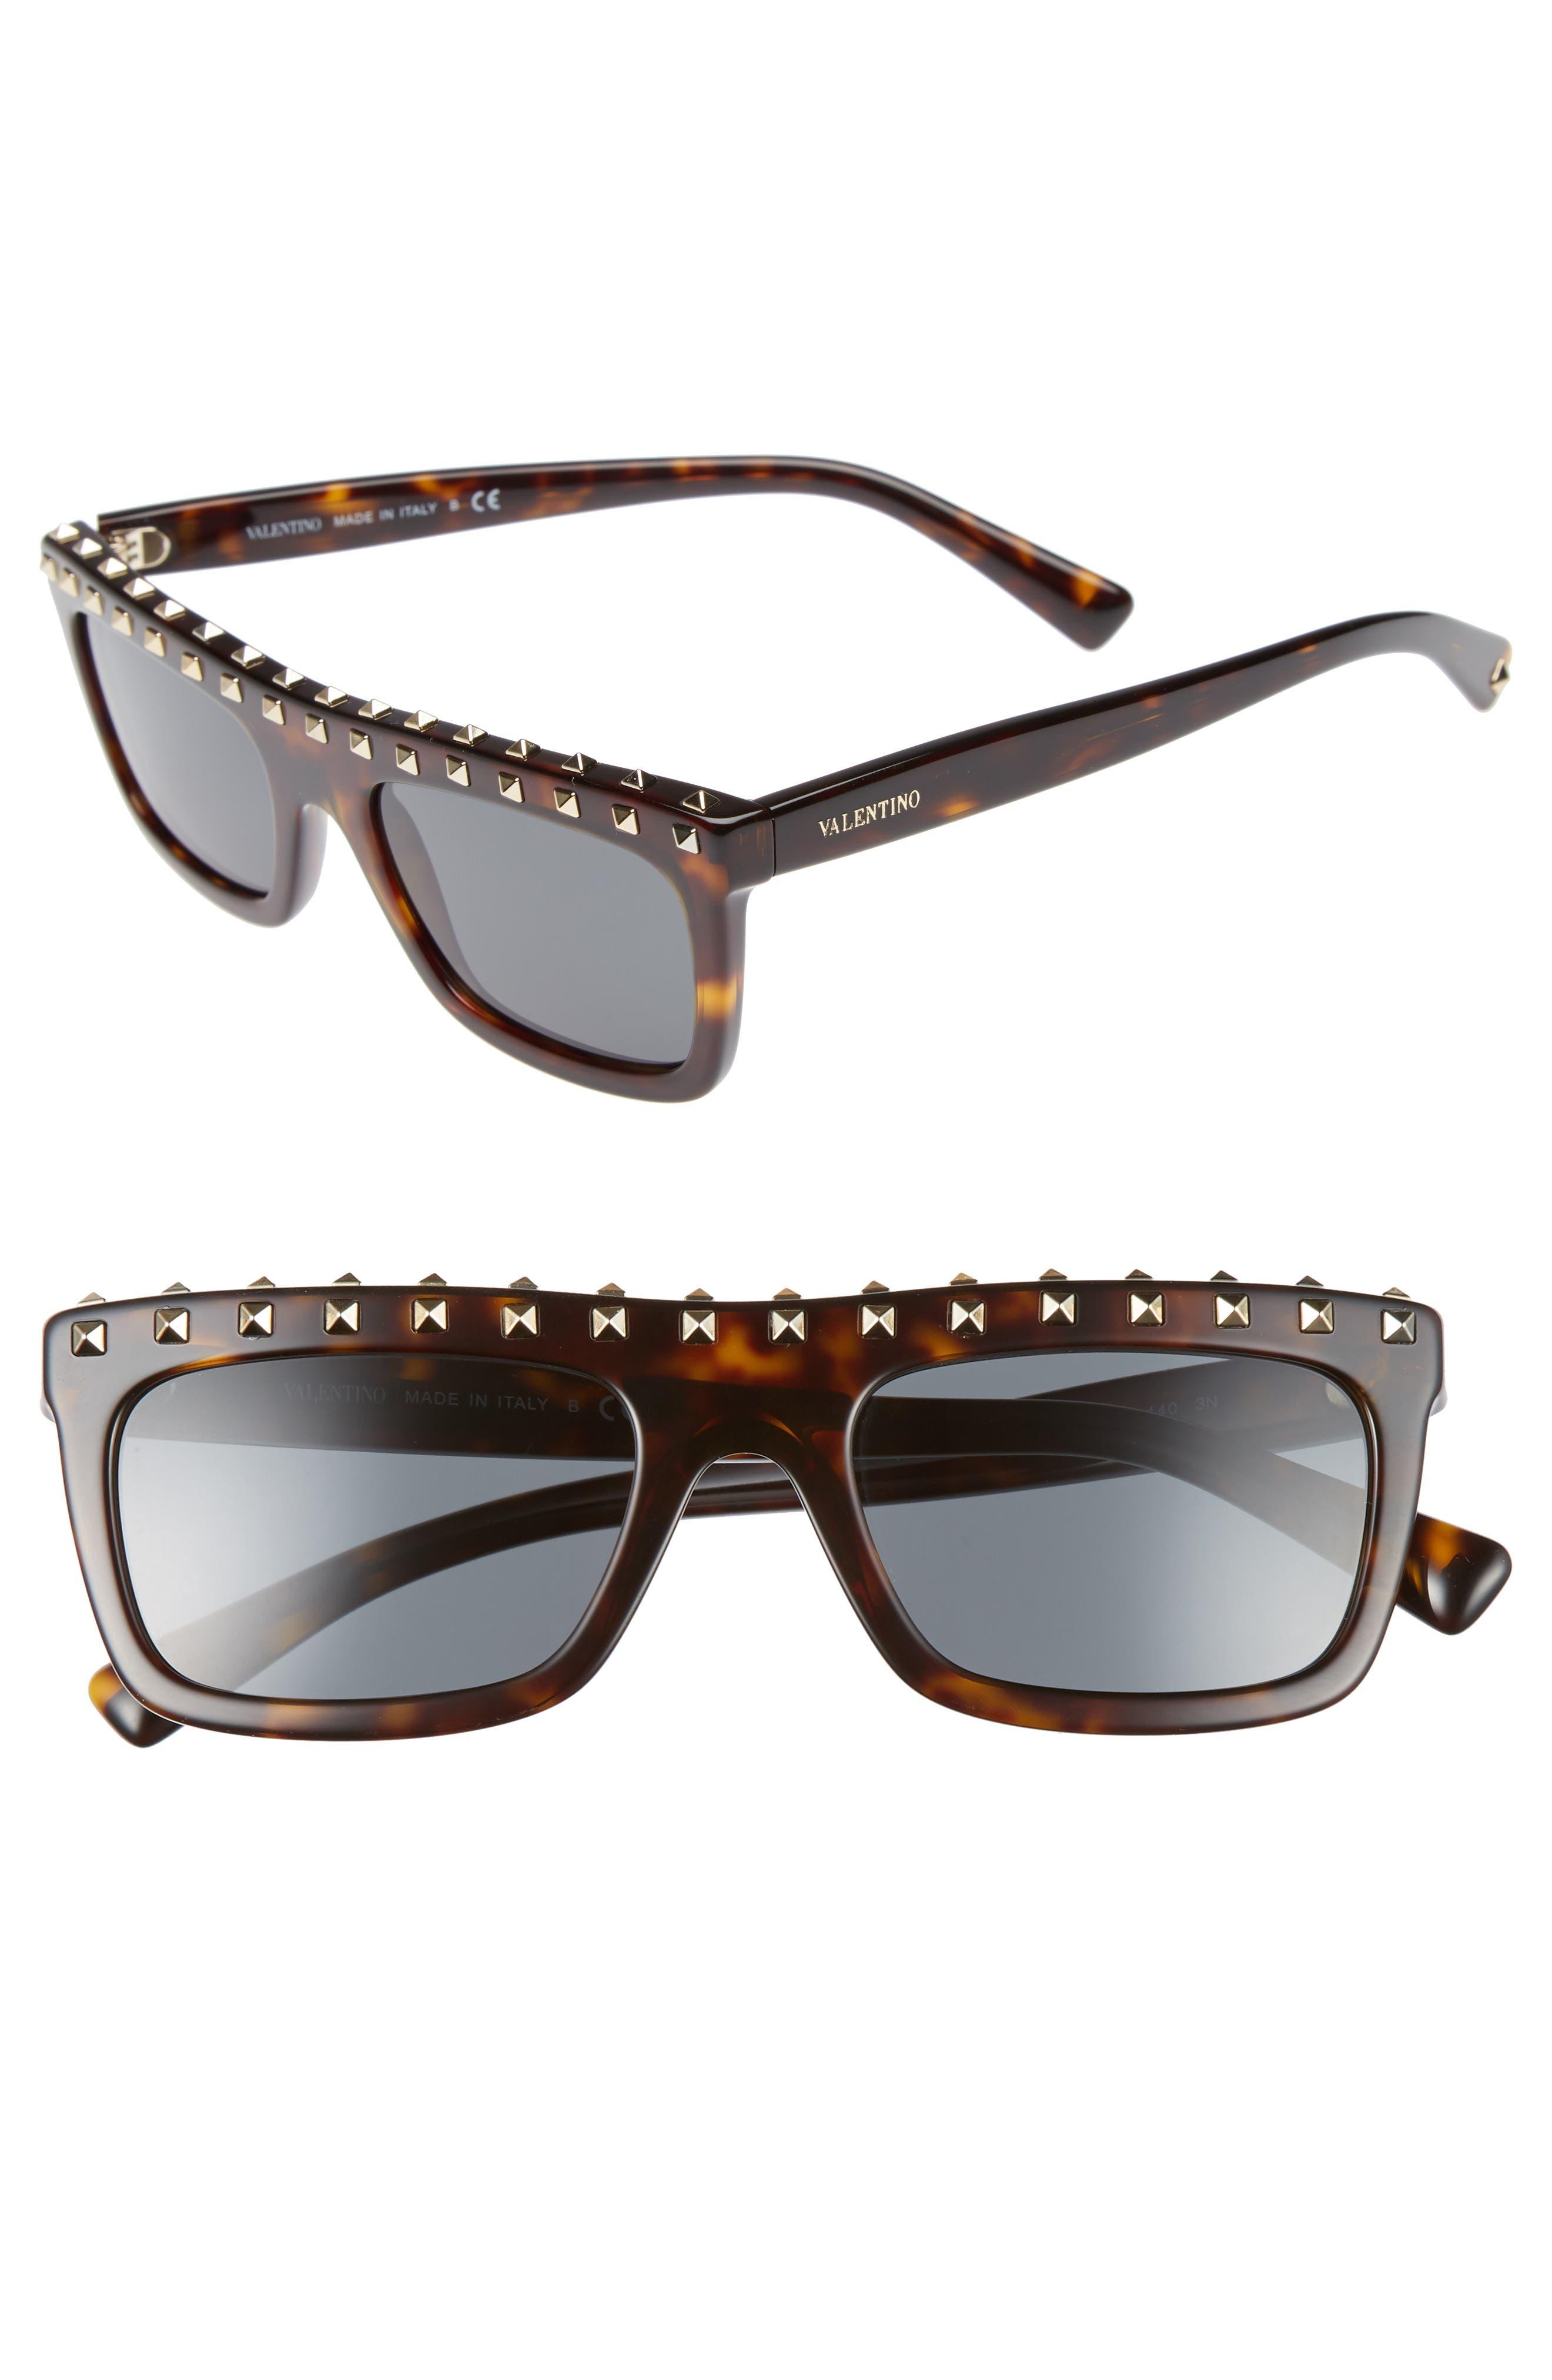 Main Image - Valentino Rockstud 51mm Rectangular Sunglasses